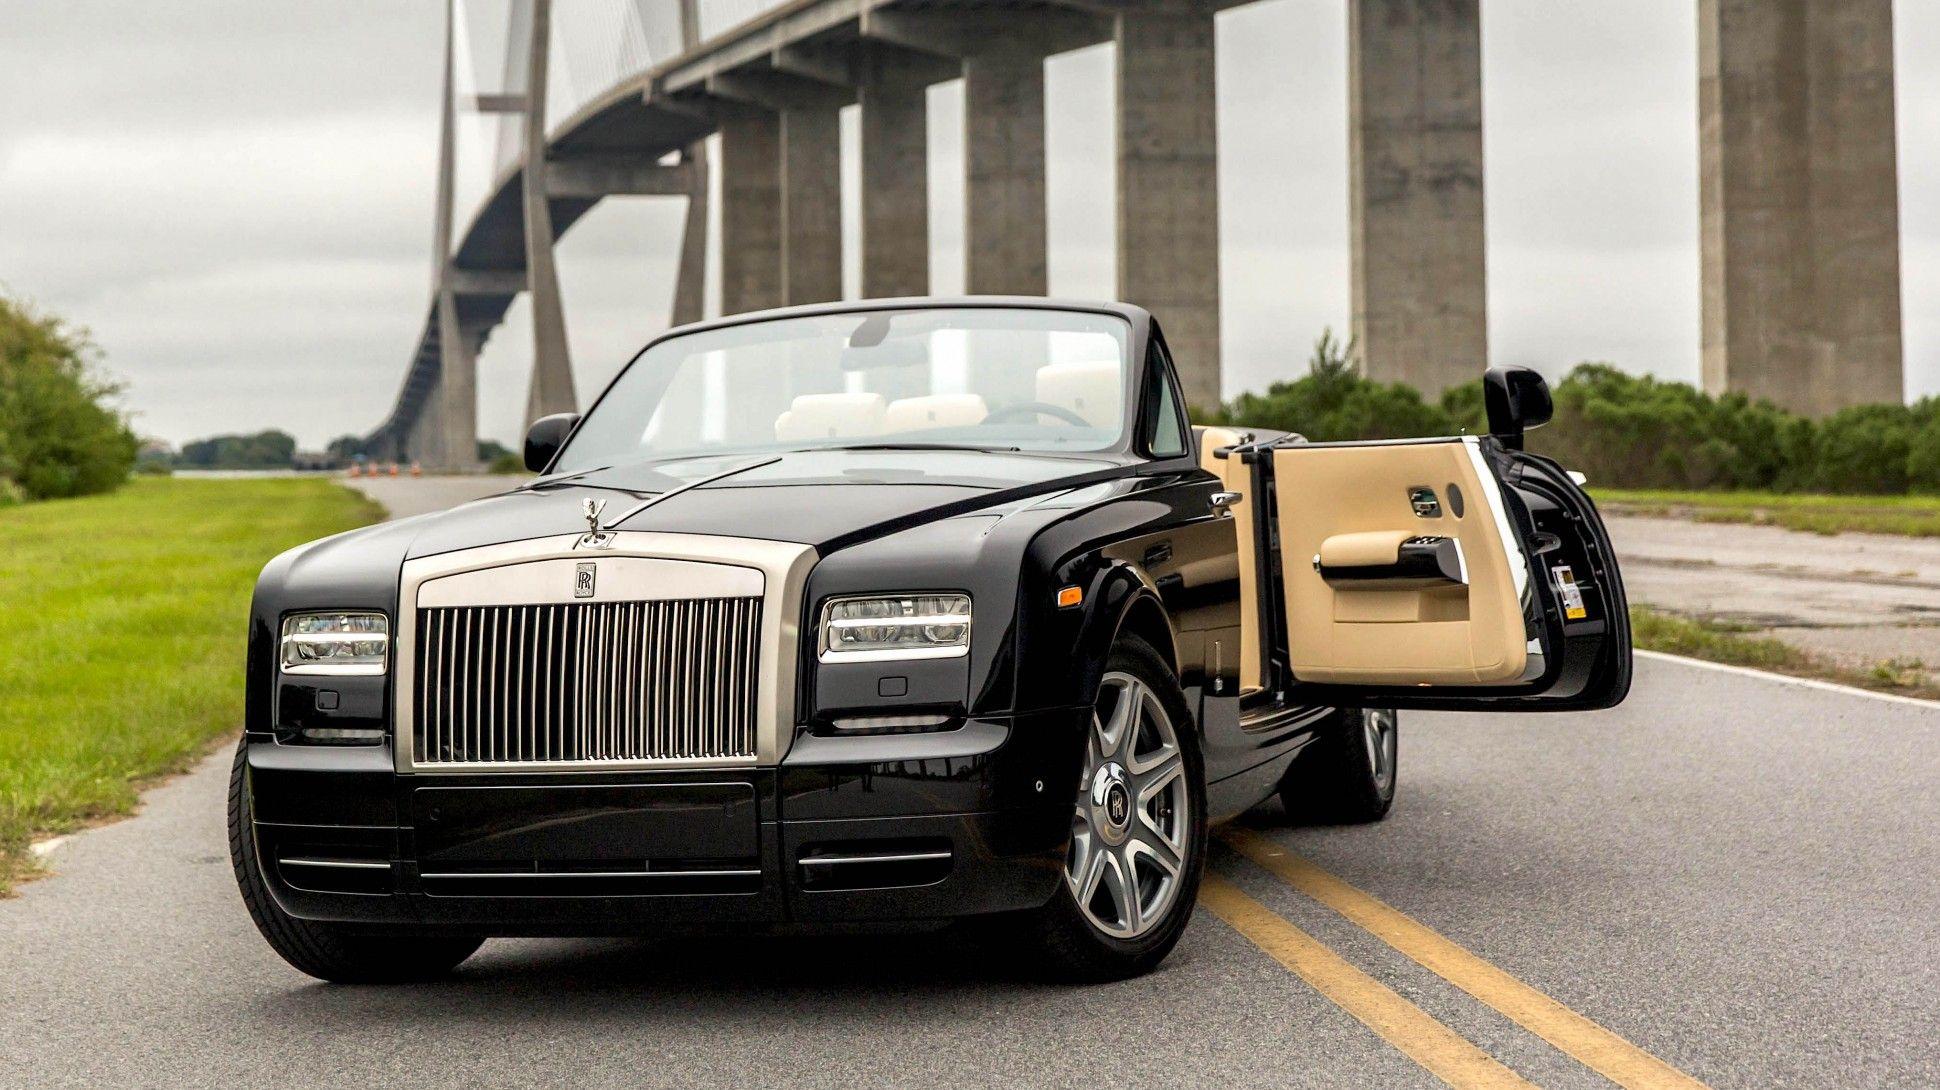 Test driving the 2015 rolls royce phantom drophead coupe